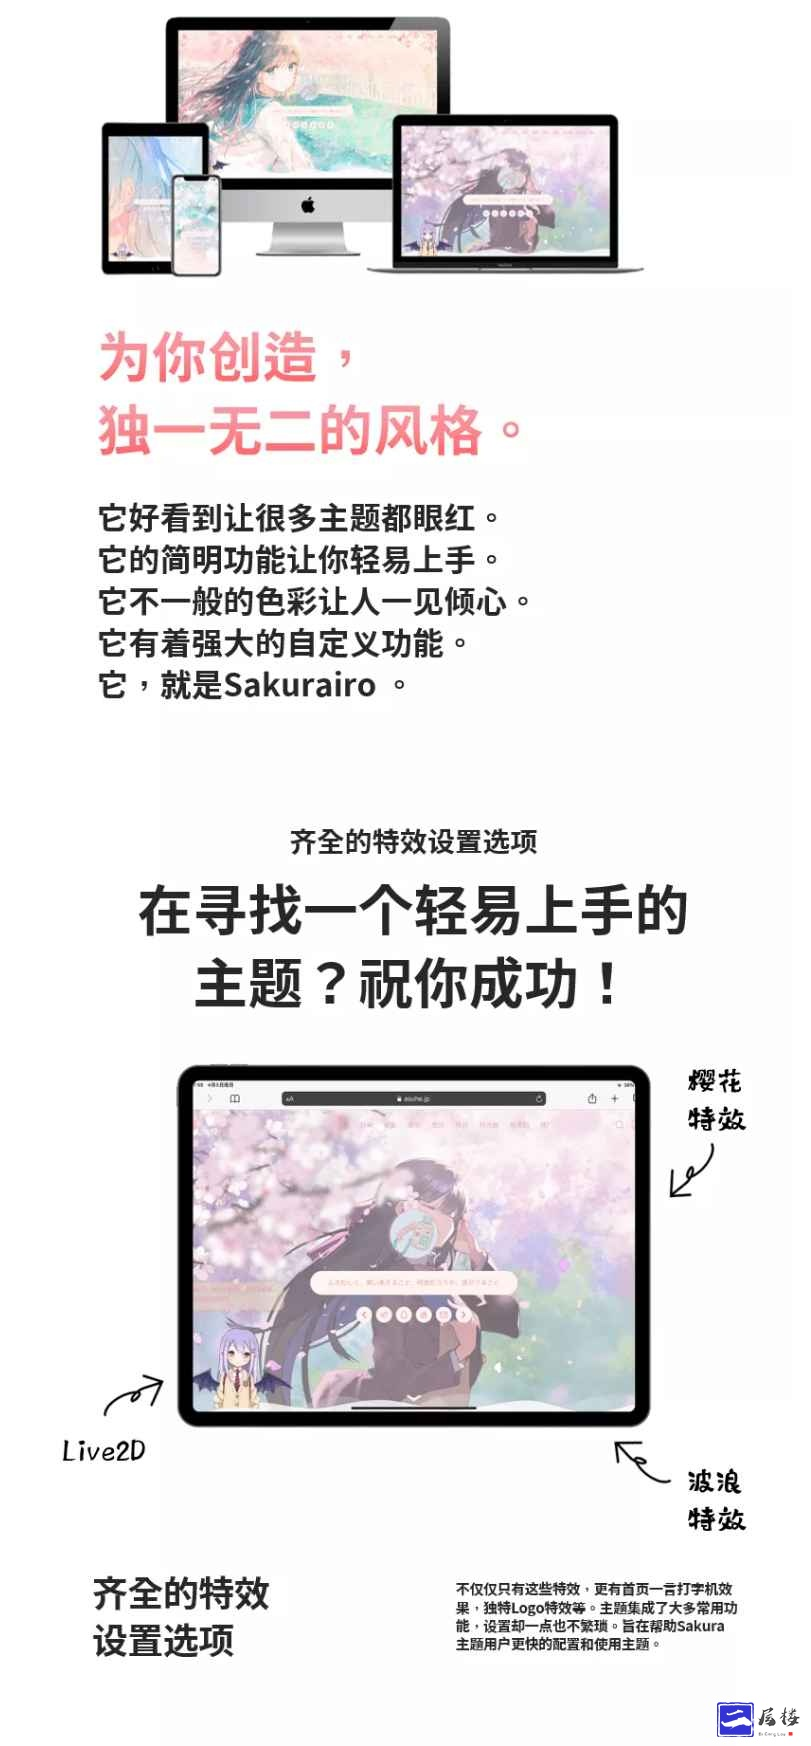 Sakurairo – 精致唯美的WordPress博客主题免费源码插图